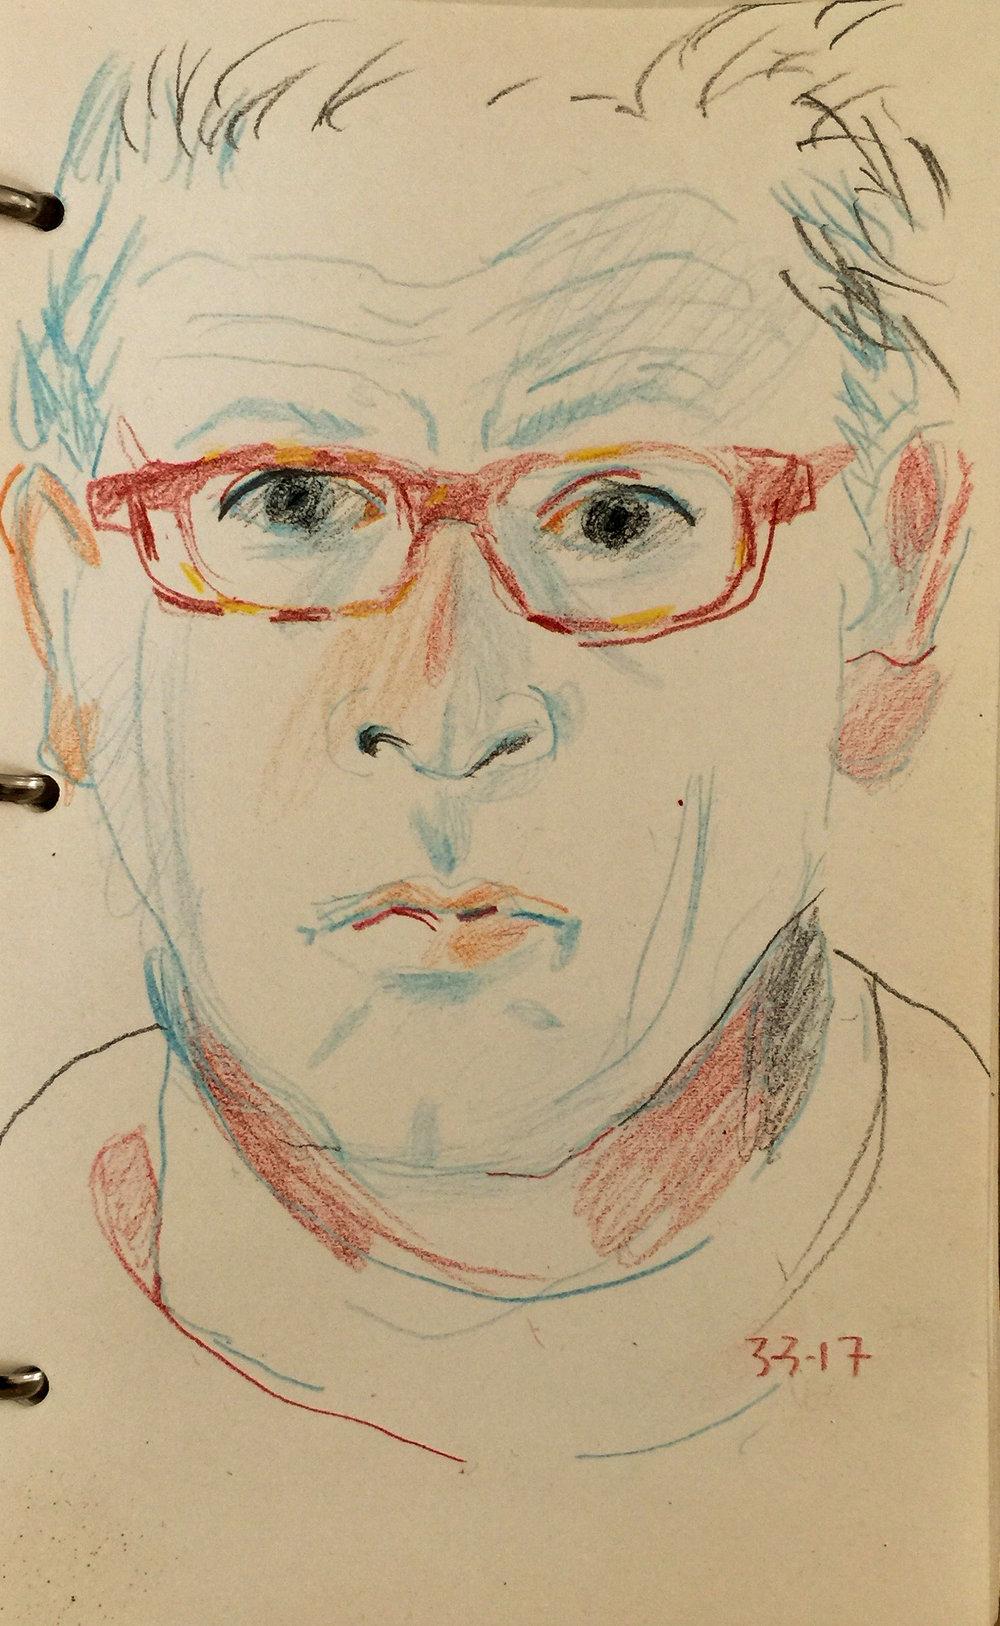 SITE-2-3-17 self portrait sketch.jpg